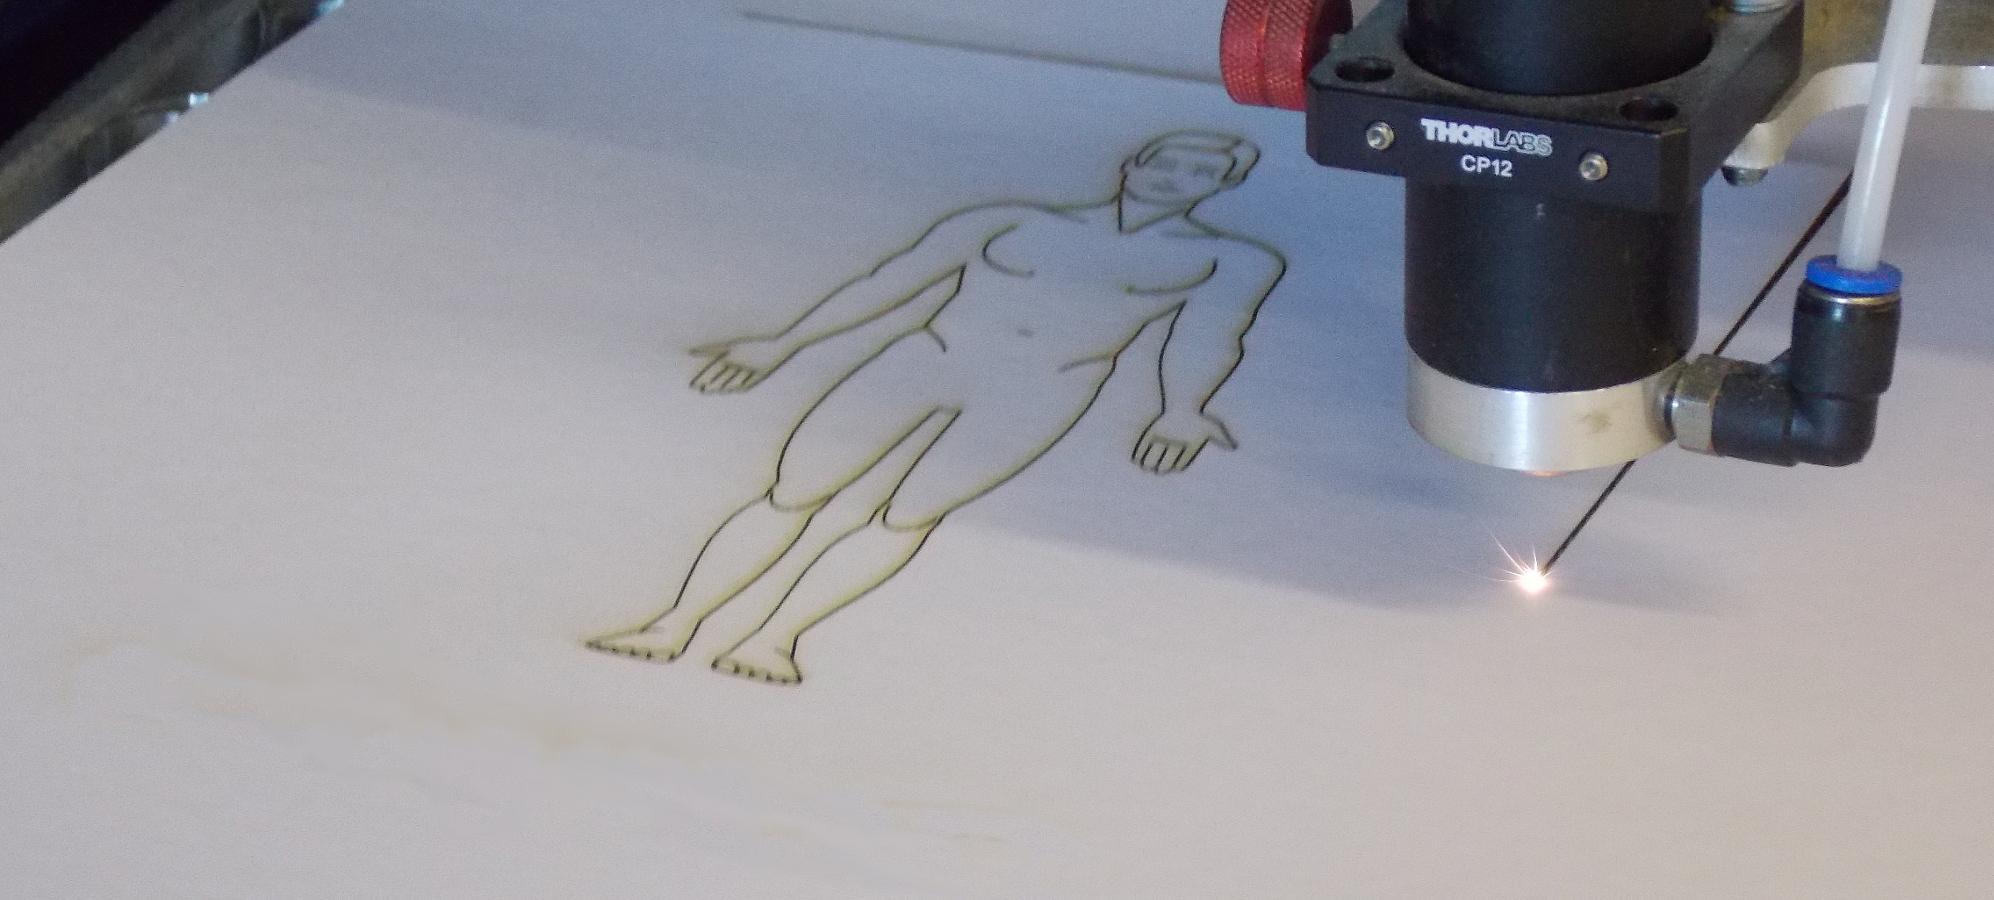 Laser cutting card